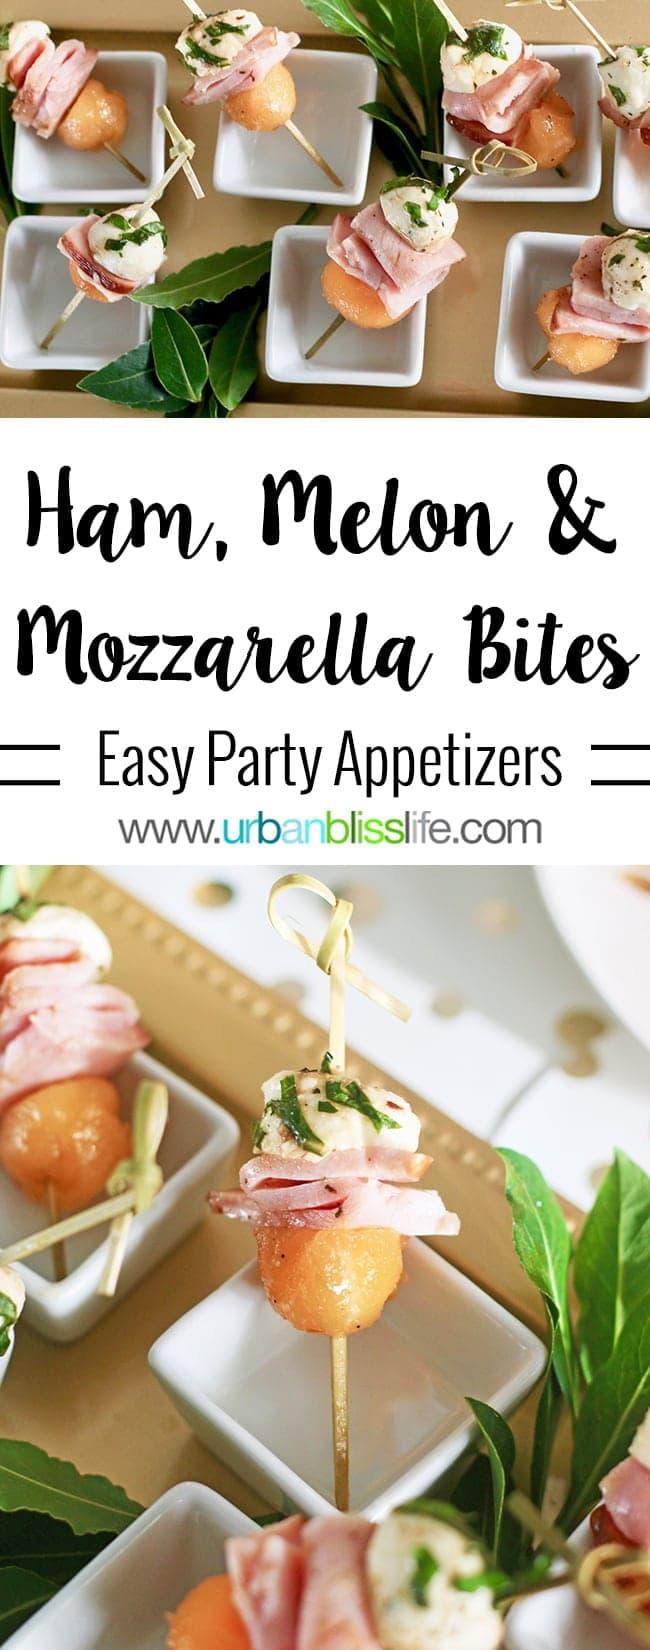 Ham, Melon, Mozarella Bites party appetizer recipe on UrbanBlissLife.com